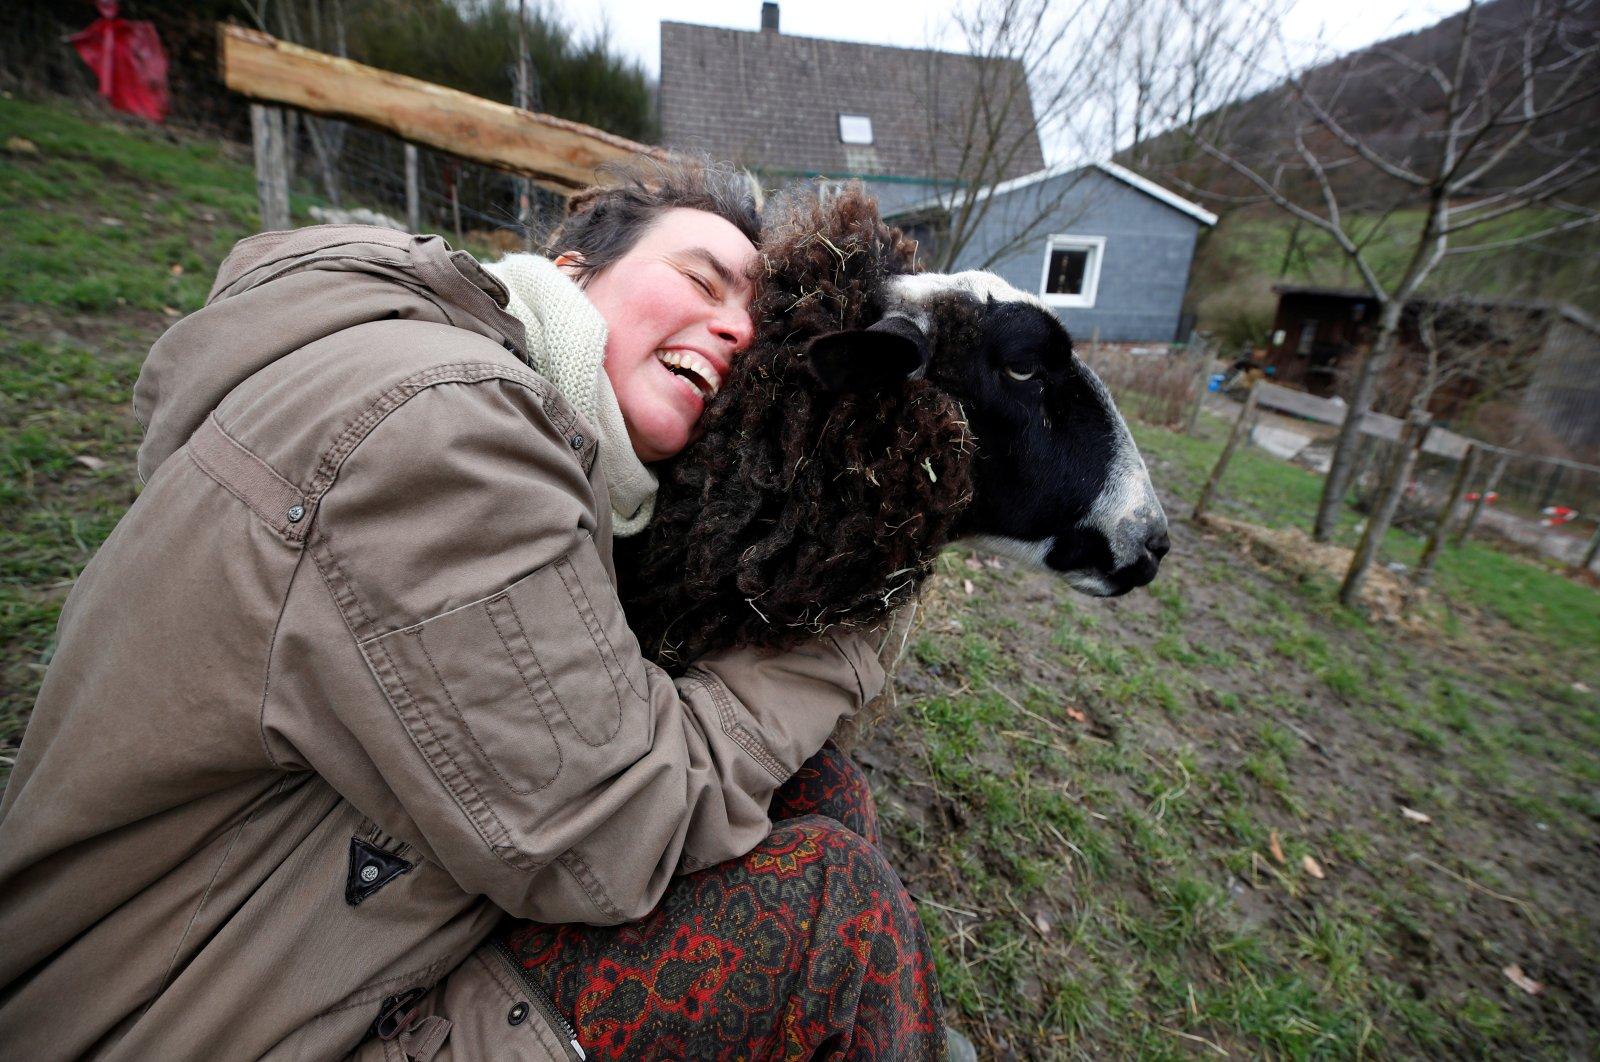 Lexa Voss, personality development coach, cuddles sheep Karlotta at her little farm, where she holds sheep cuddling seminars during COVID-19 lockdown in Hattingen, near Wuppertal, Germany, March 11, 2021. (Reuters)